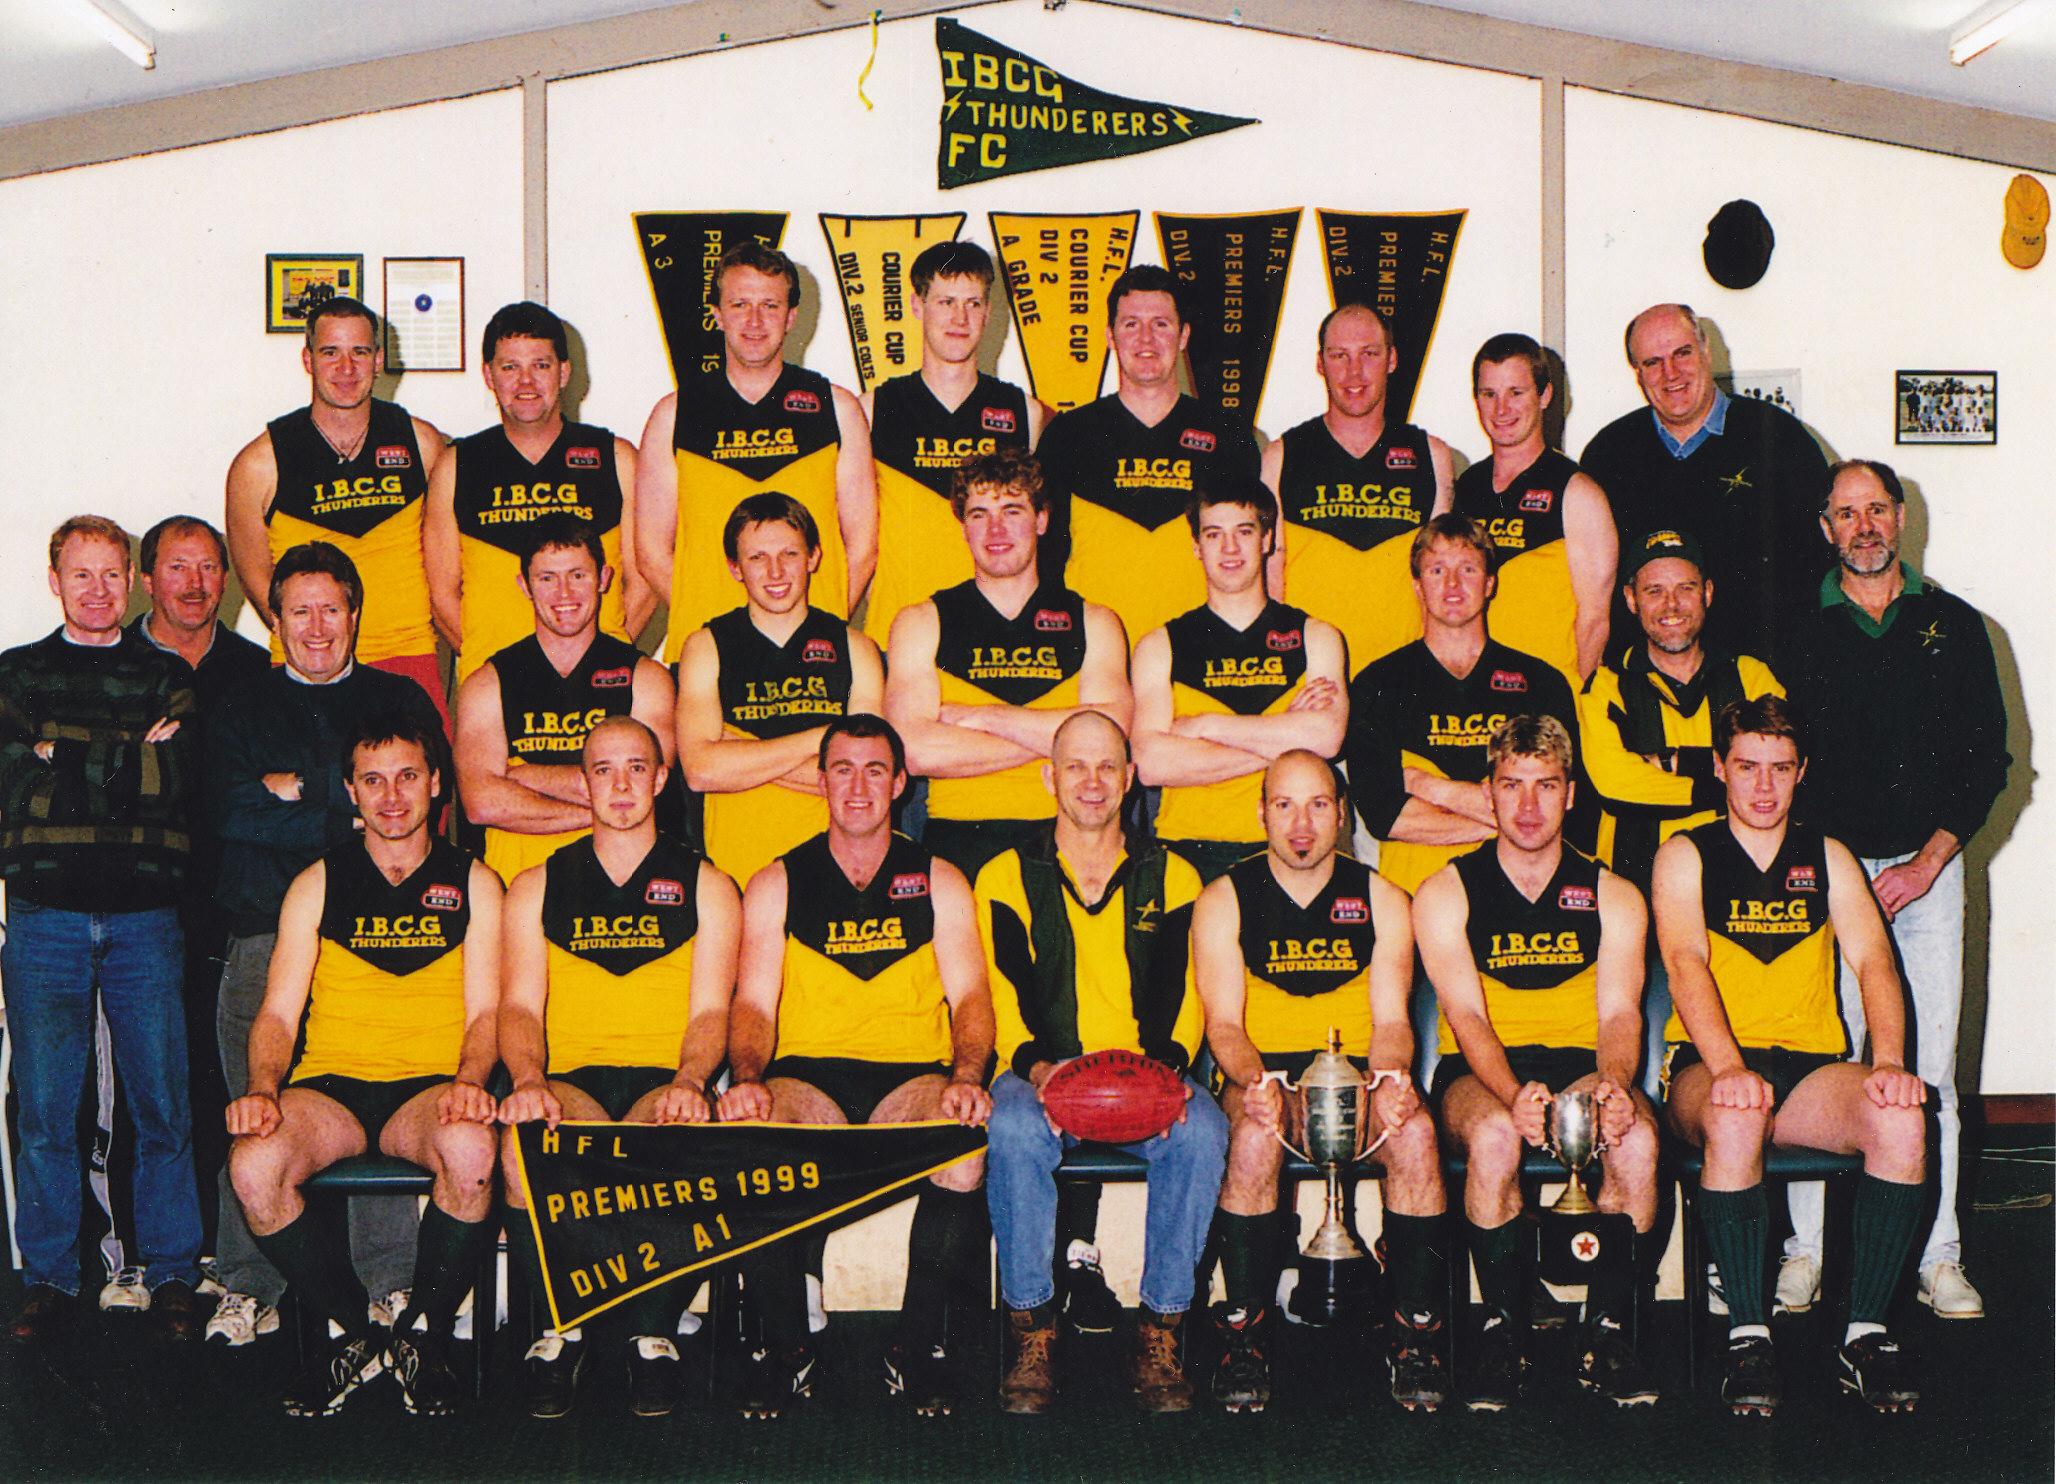 1999 A Premiers.jpg